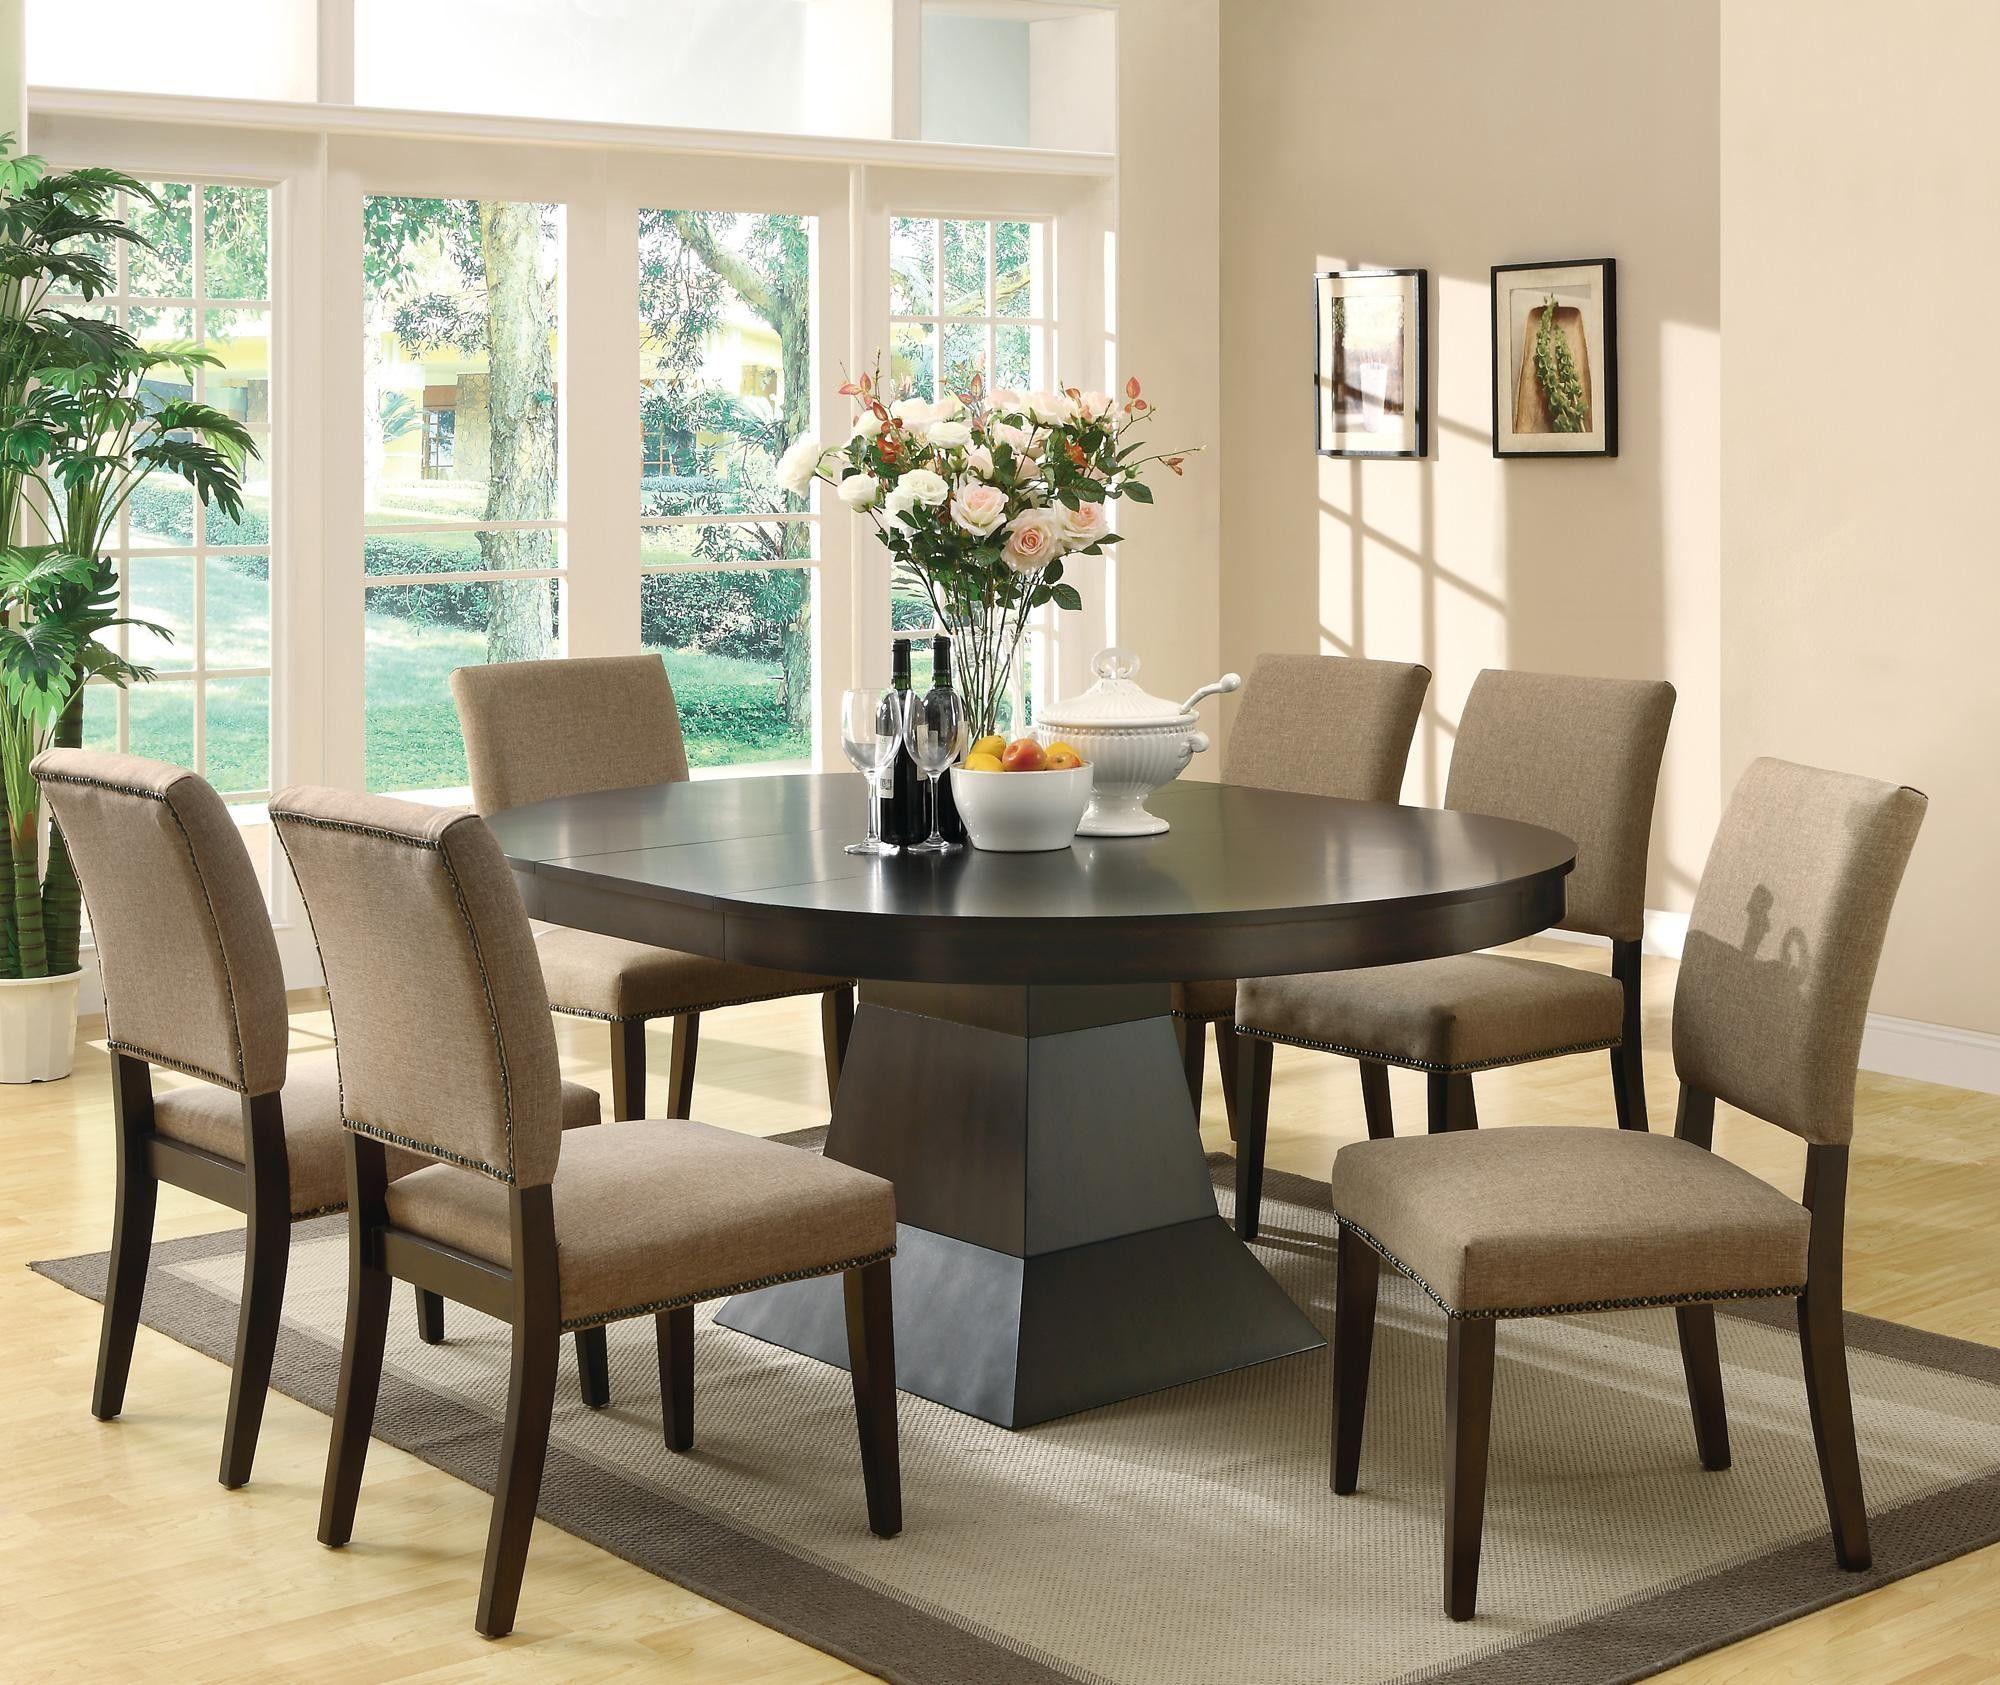 Coaster fine furniture 103571103572 myrtle oval dining